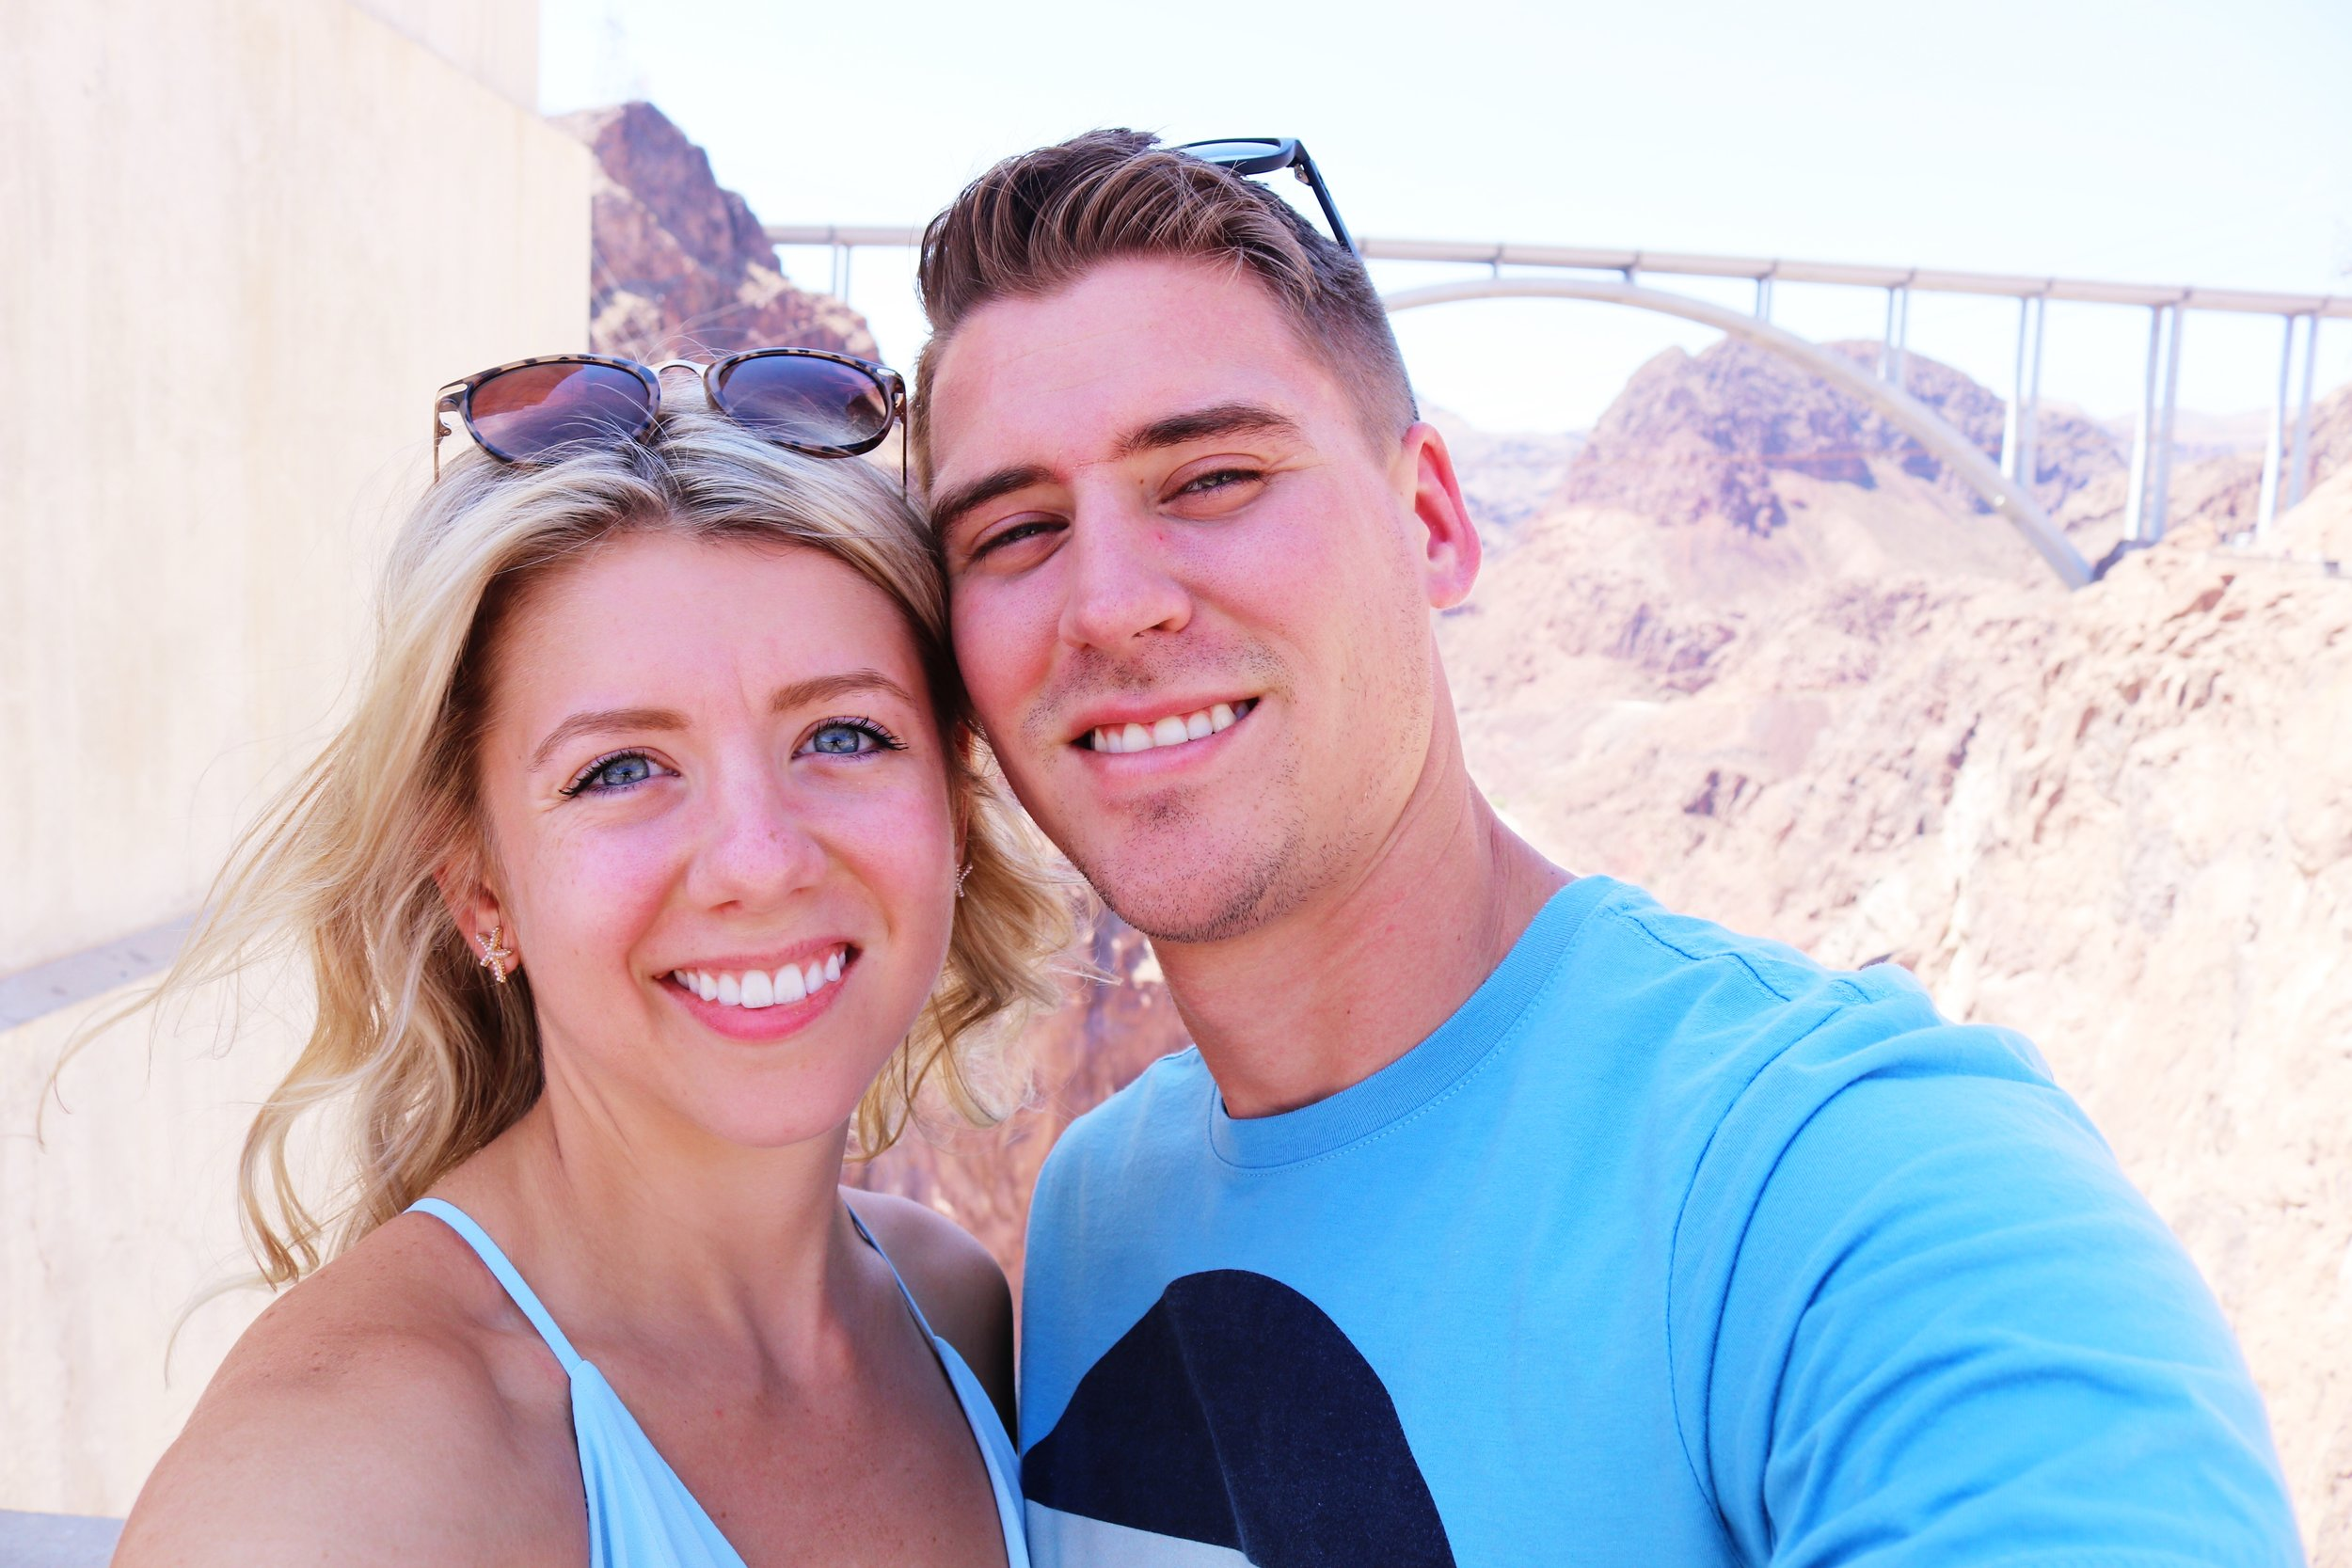 15 Things to do in Las Vegas - Blogger Sarah J - Las Vegas Travel Guide - Top Travel Blogger (18).JPG